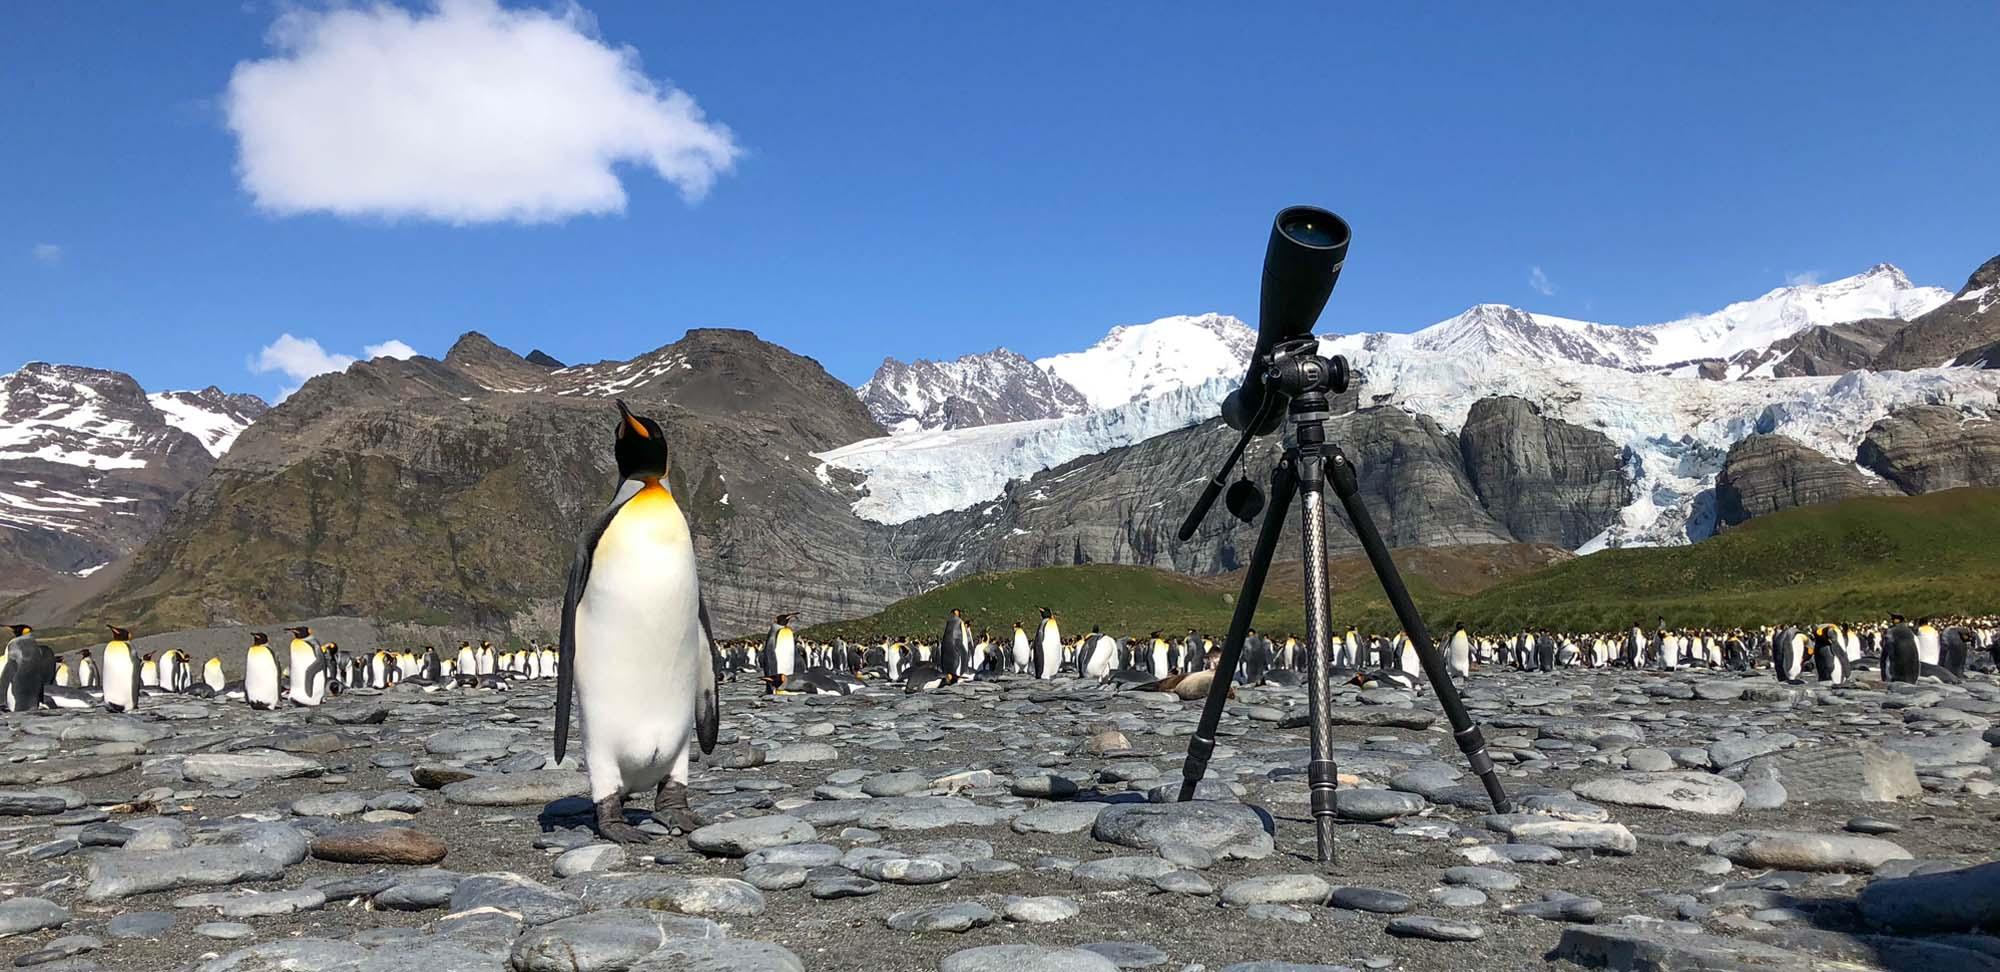 Fledgling birder Field Guides Birding Tours Antarctica